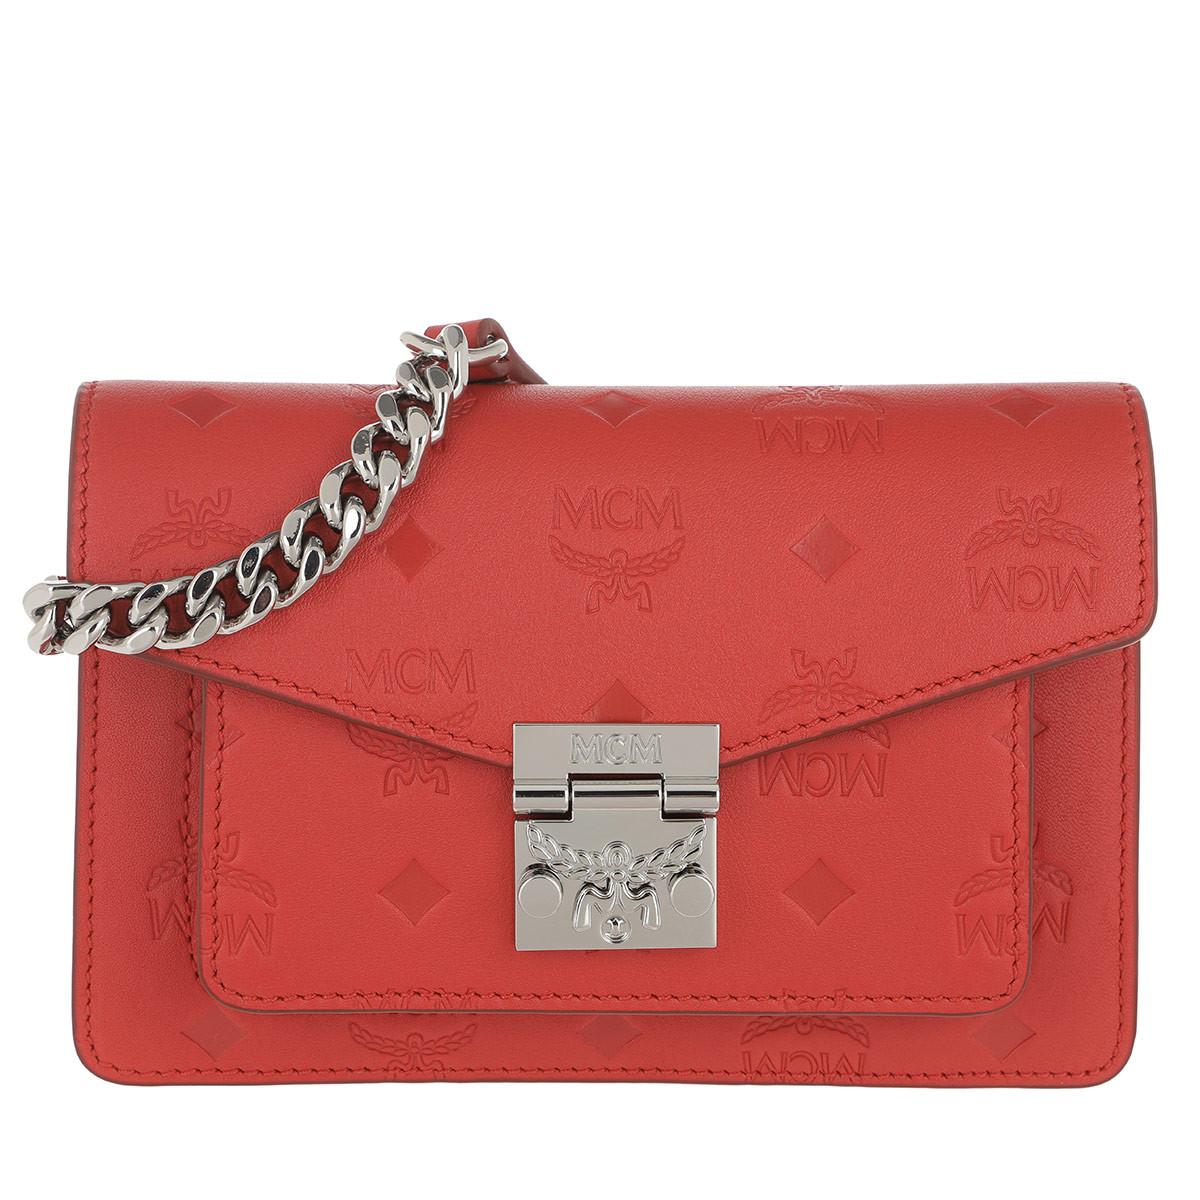 MCM Gürteltasche - Patricia Monogrammed Leather Belt Bag Xmini Viva Red - in rot - für Damen